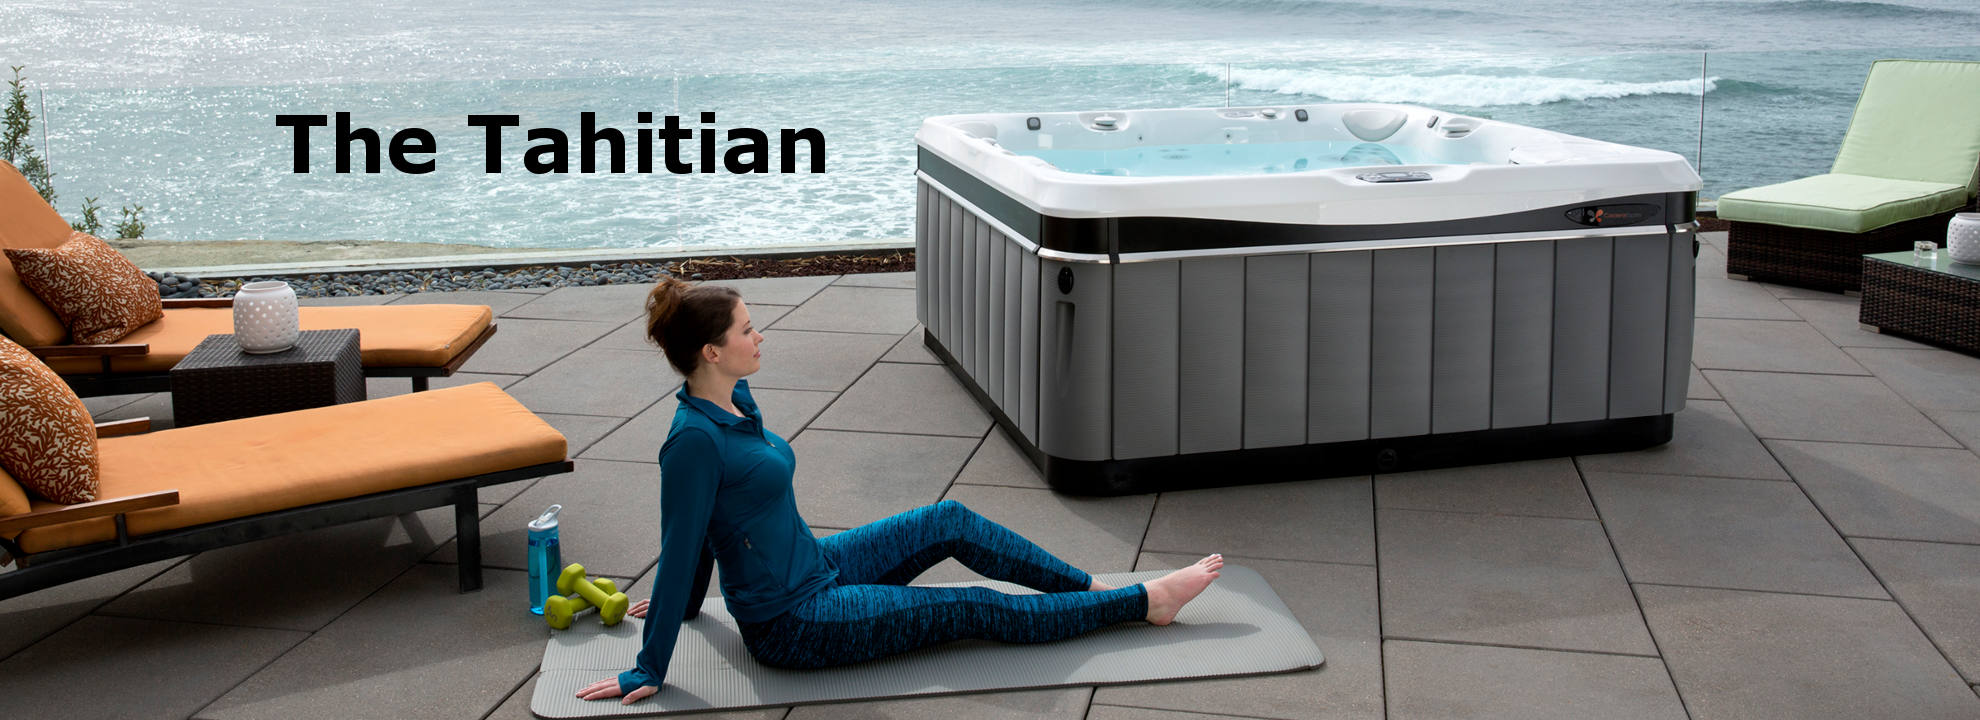 The Tahitian Hot Tub MA NH